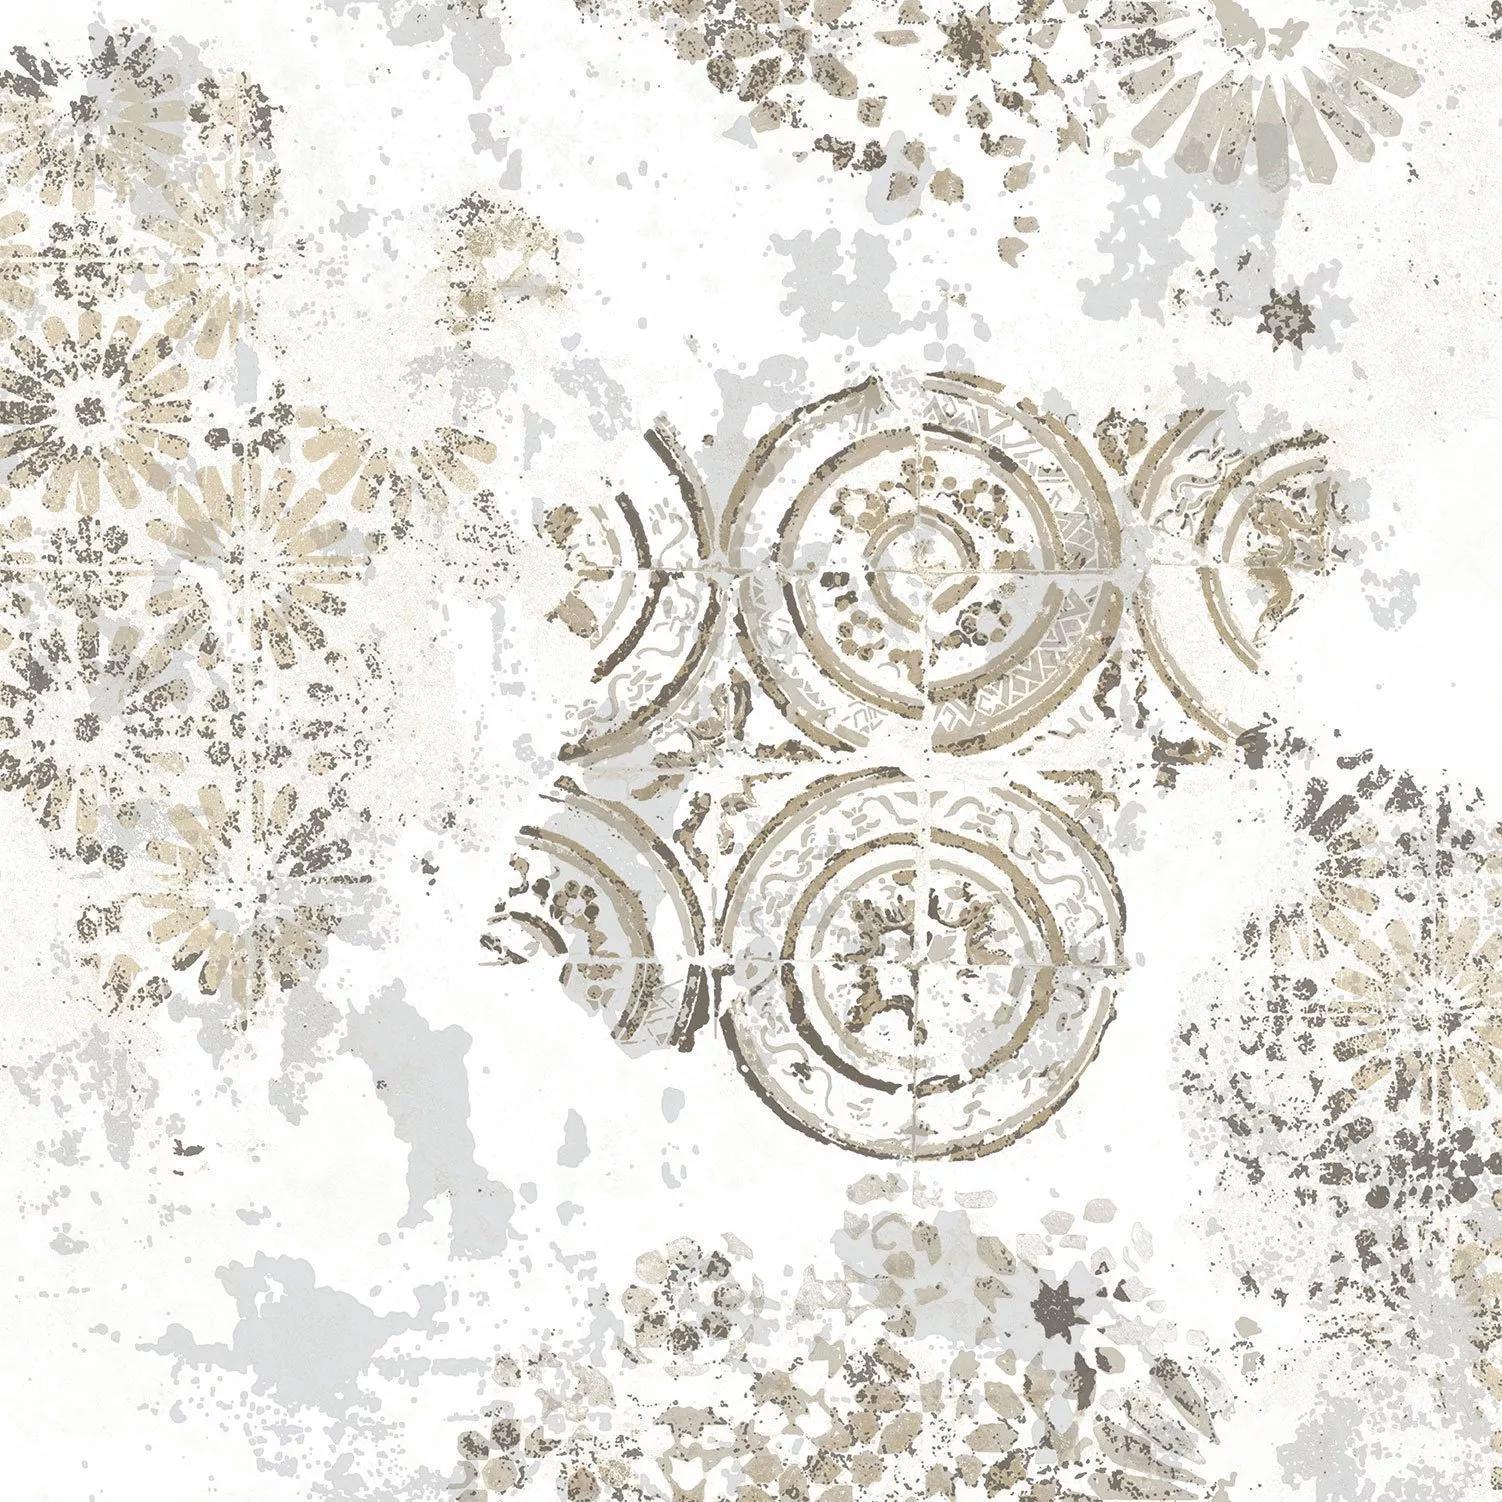 Luxus tapéta fehér alapon orintális hangulatú geometrikus mintával